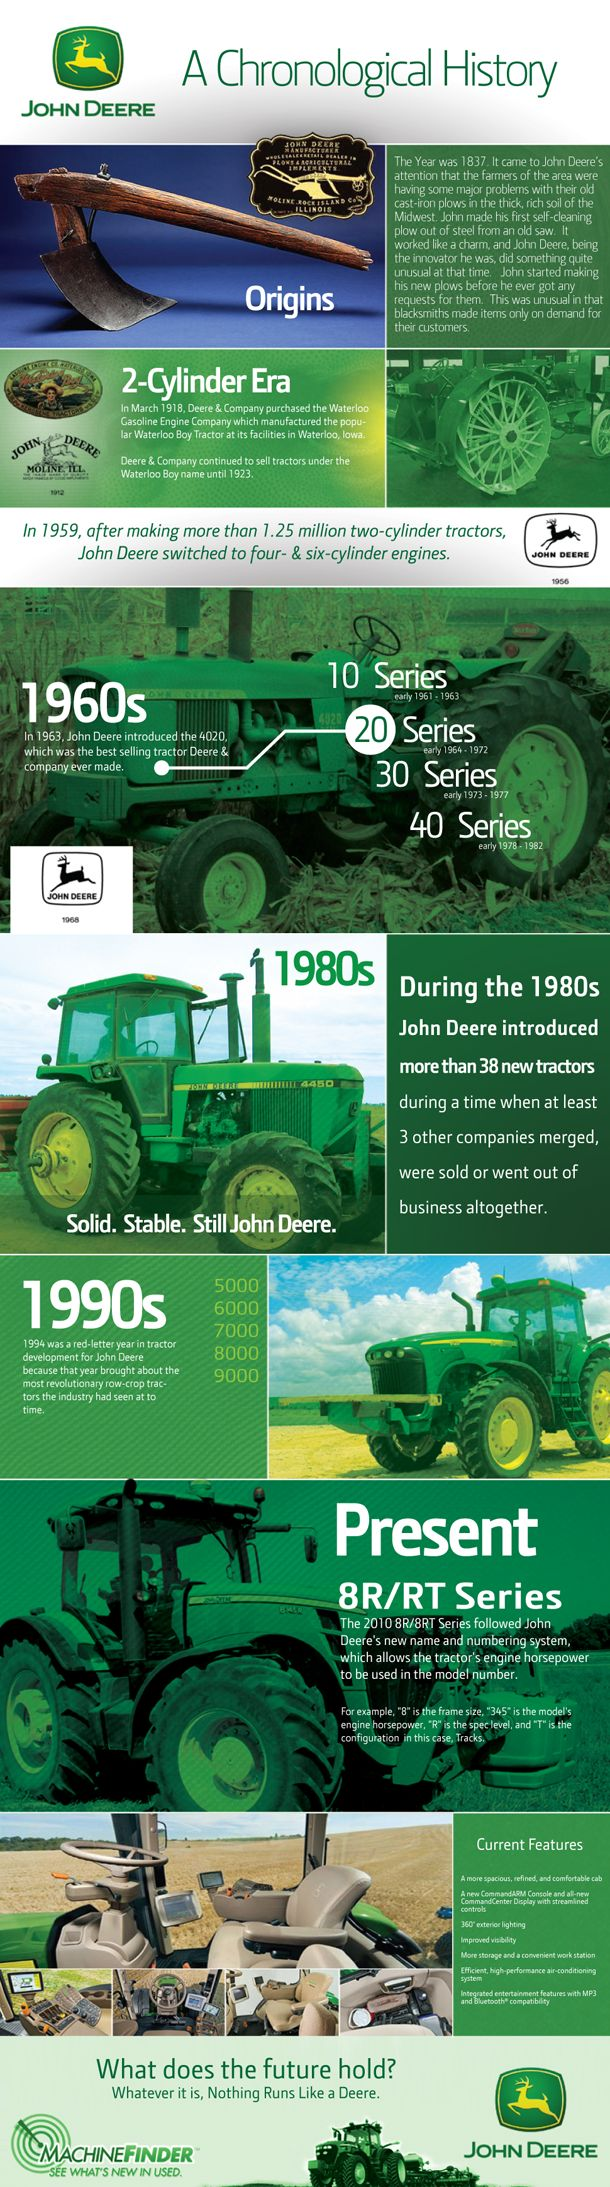 A chronological history of John Deere